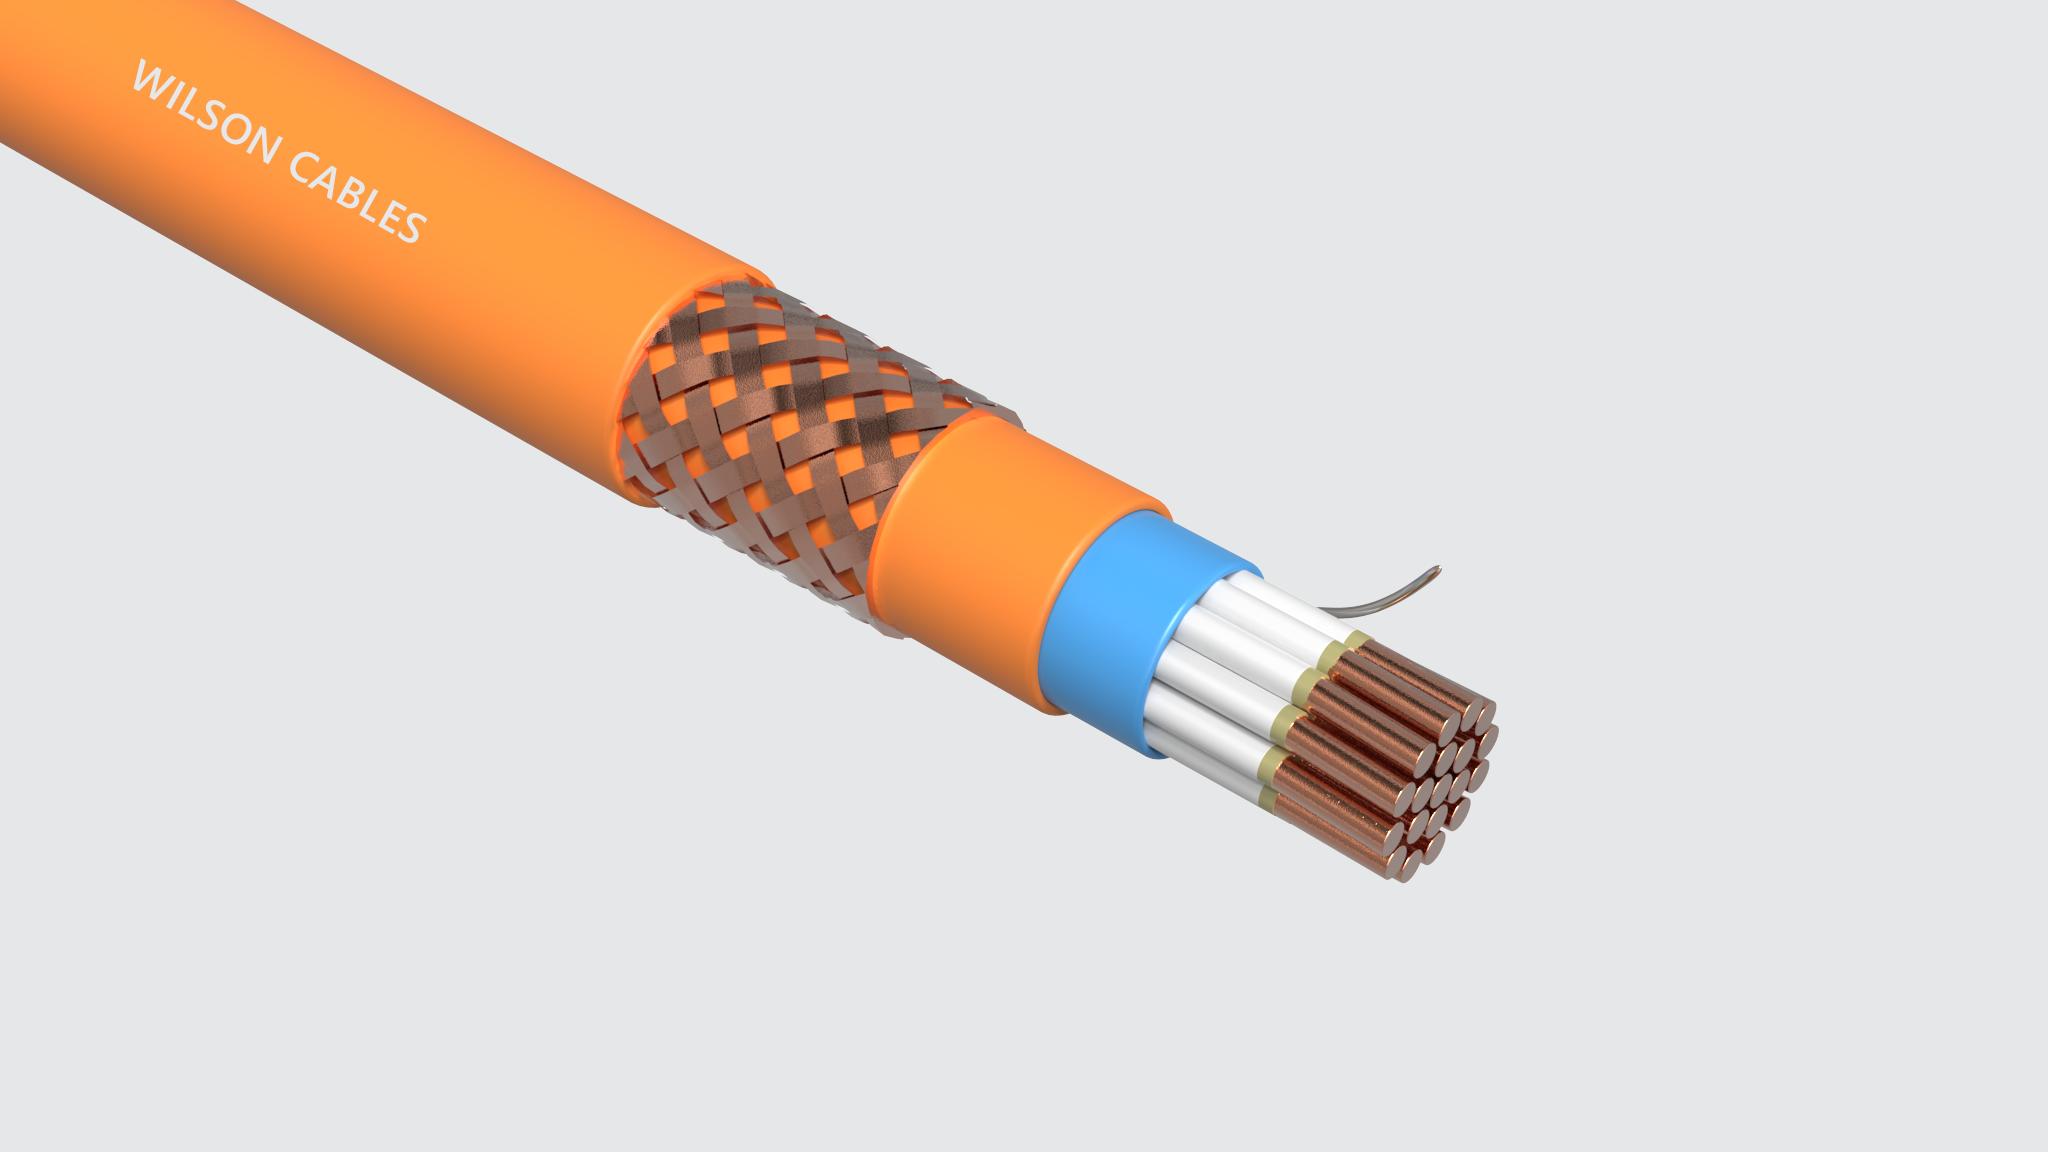 FRIM-200Q-M / FRIM-200C-M Fire Resistant Shipboard Braided Instrumentation Cables